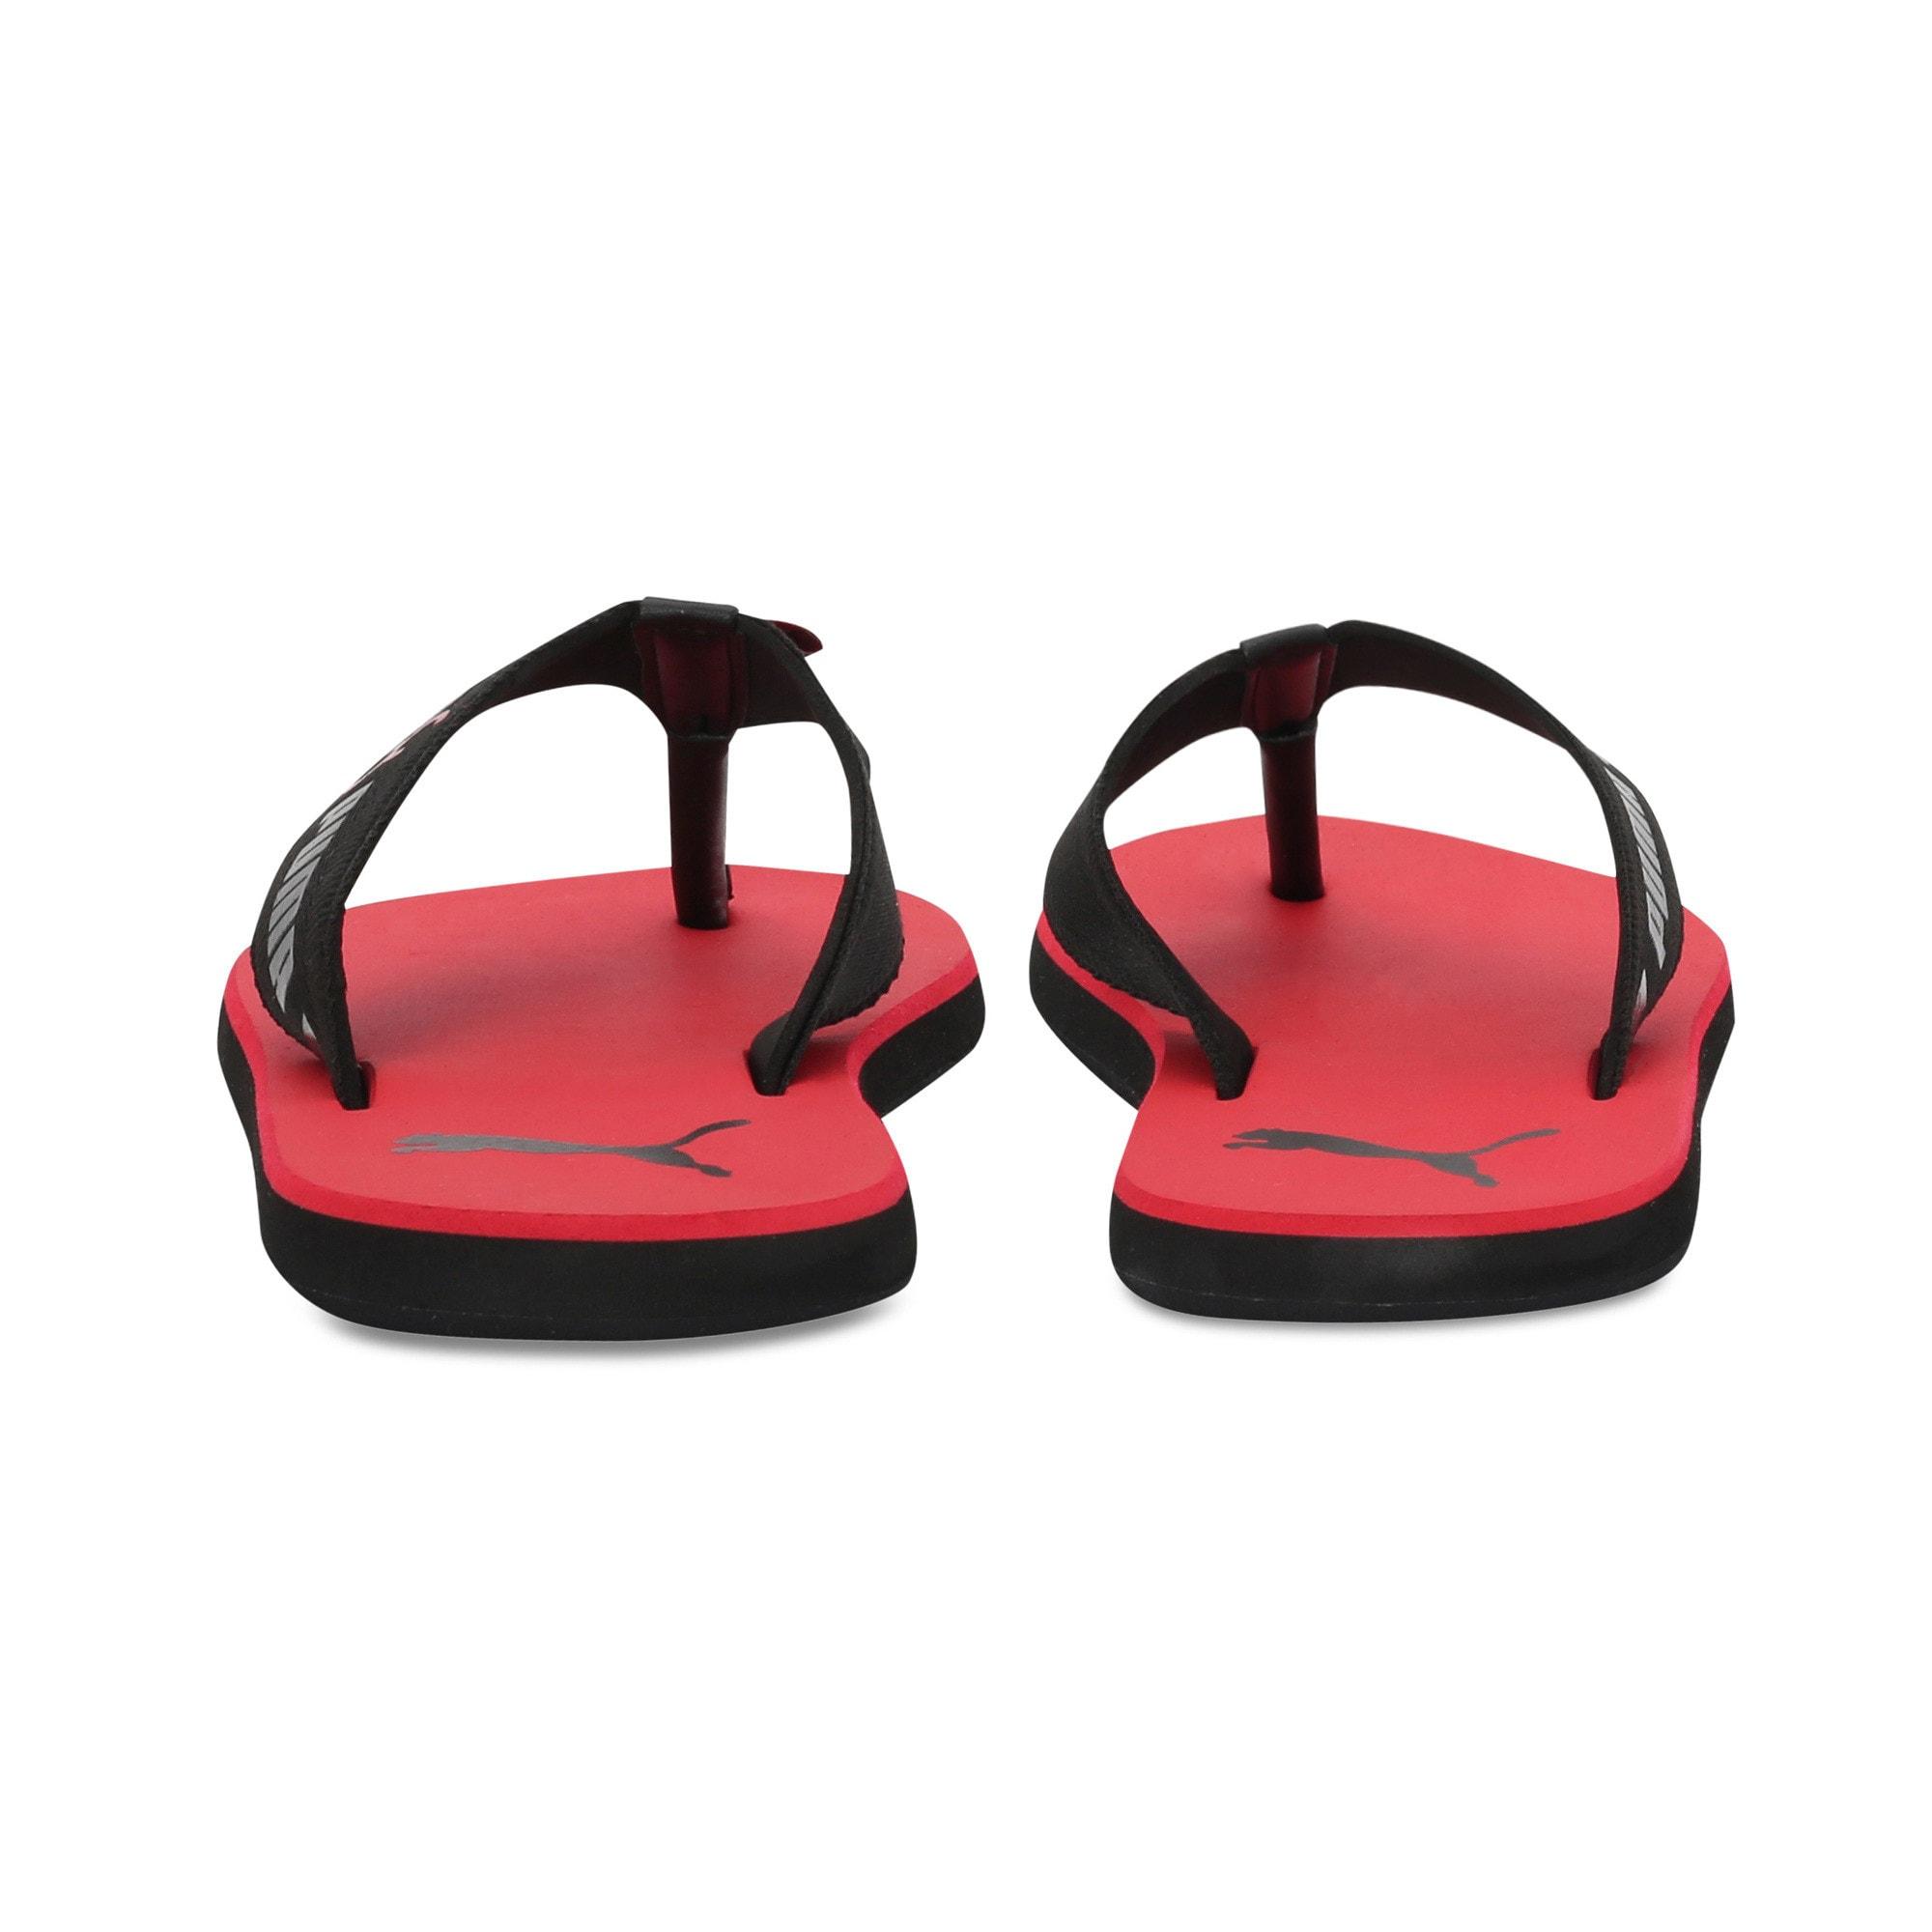 Thumbnail 3 of Breeze one8 GU Men's Sandals, High Risk Red-Puma Black, medium-IND